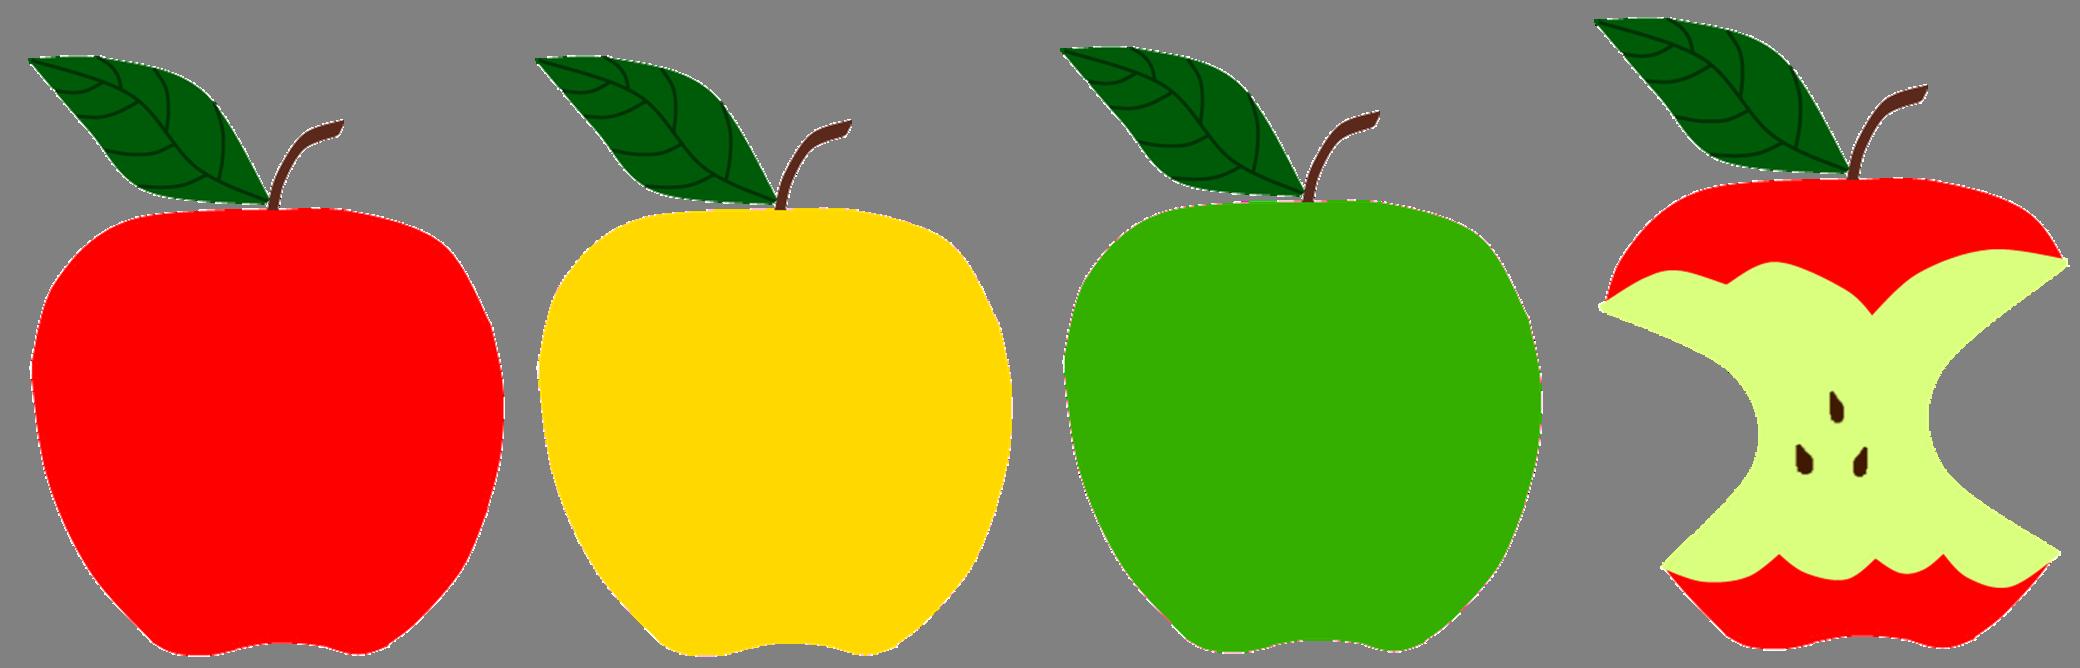 apples sunflower storytime raise hand clipart raise hand clipart black and white